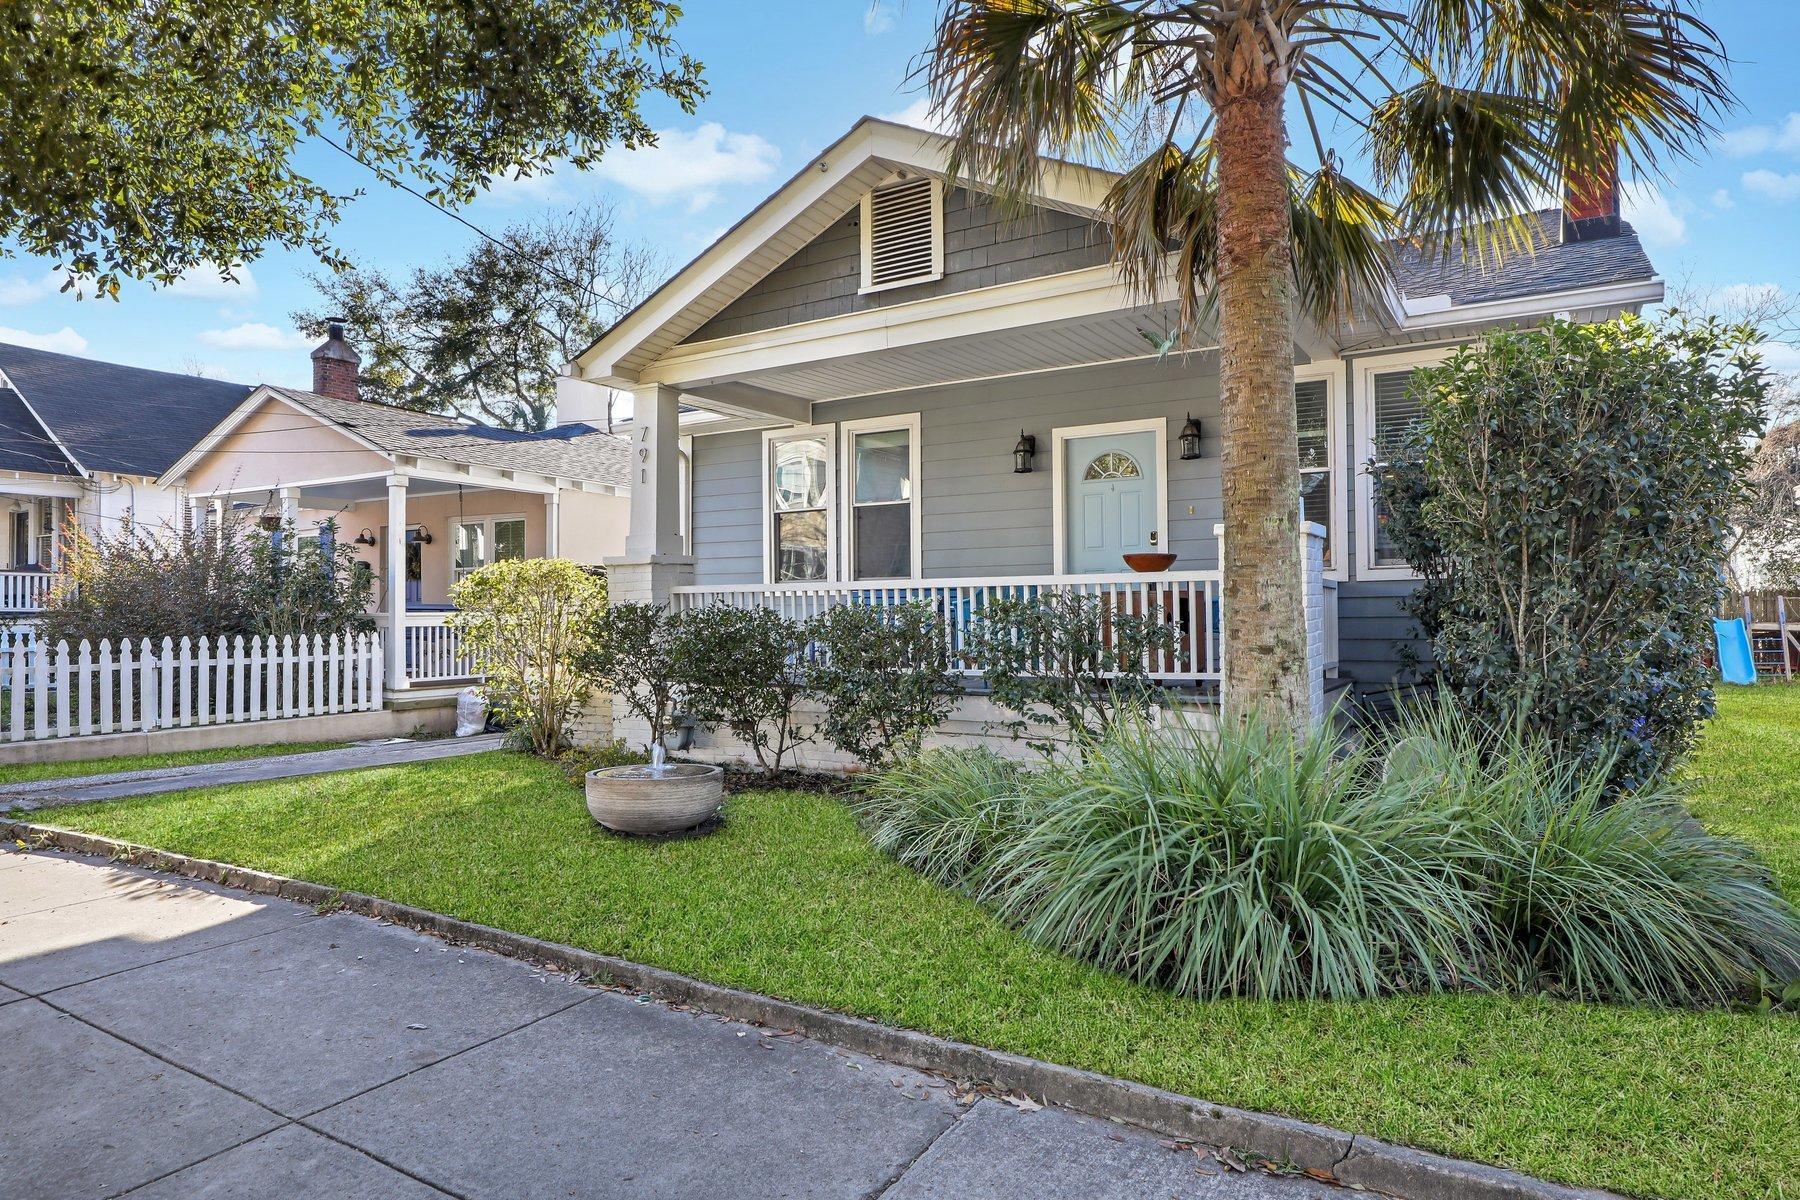 Rutledge Green Homes For Sale - 791 Rutledge, Charleston, SC - 12